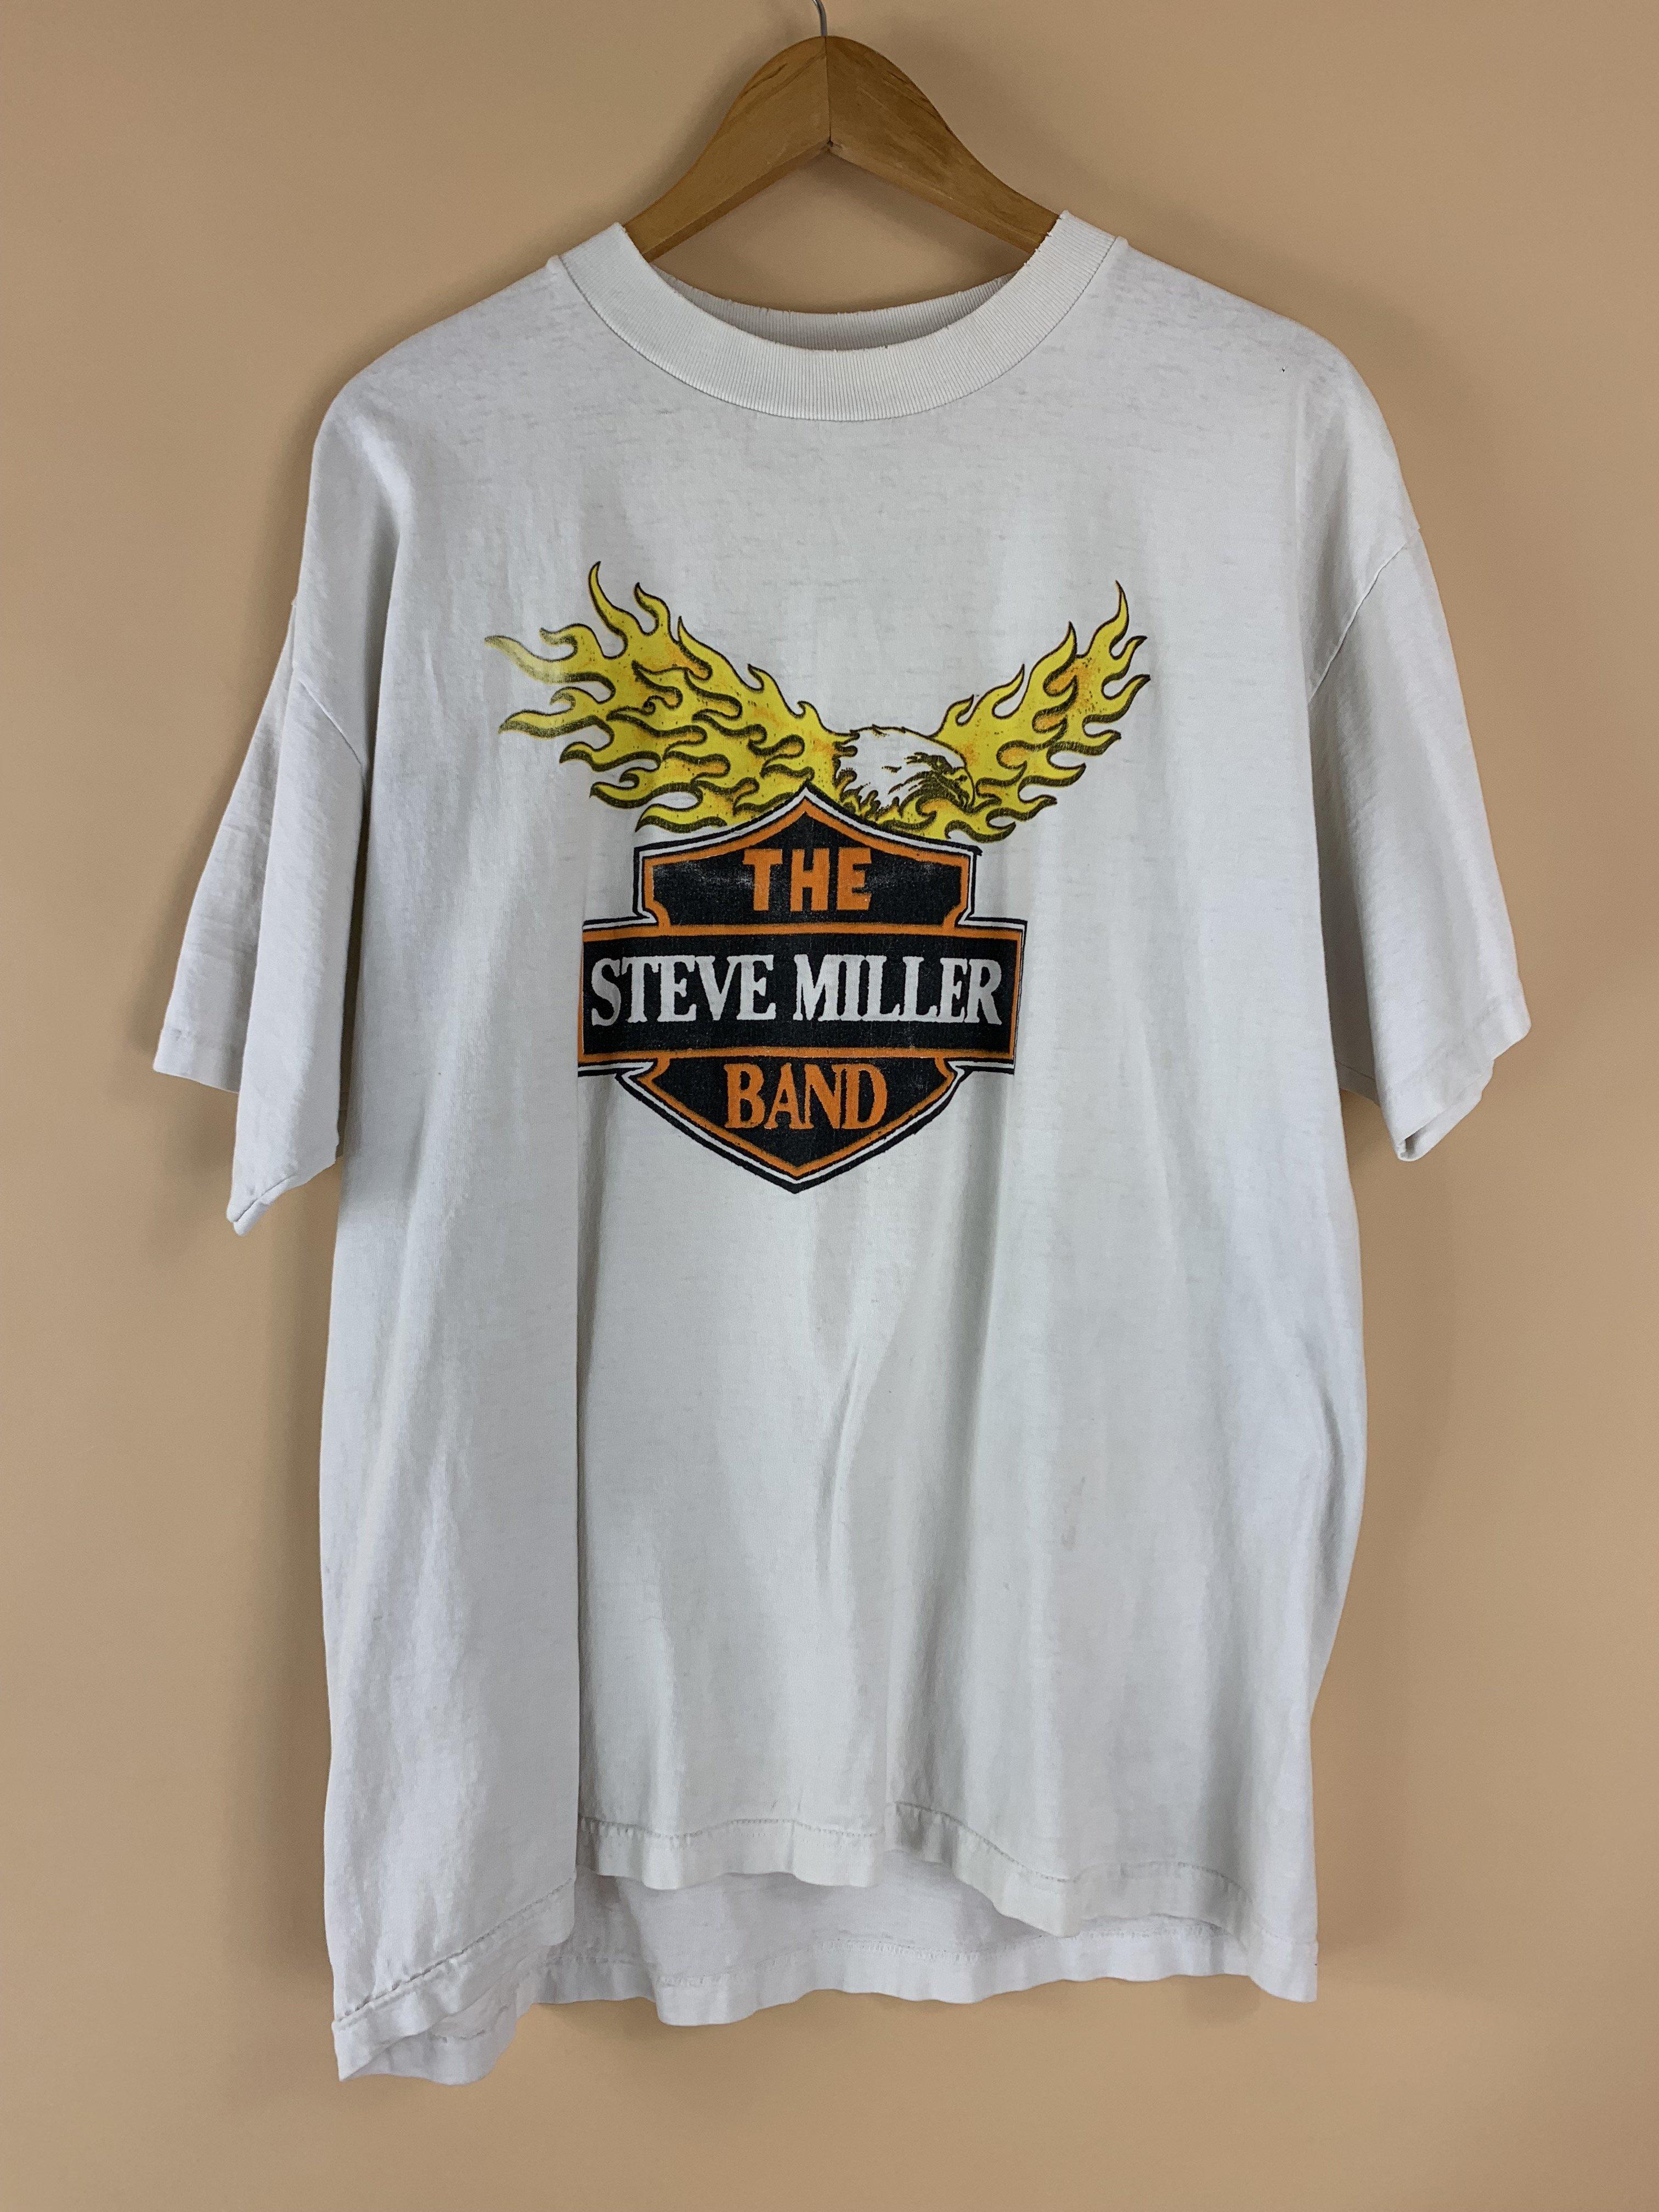 7d3eeab59 RABA MARFA VINTAGE 1997 THE STEVE MILLER BAND TEE | Garmentory